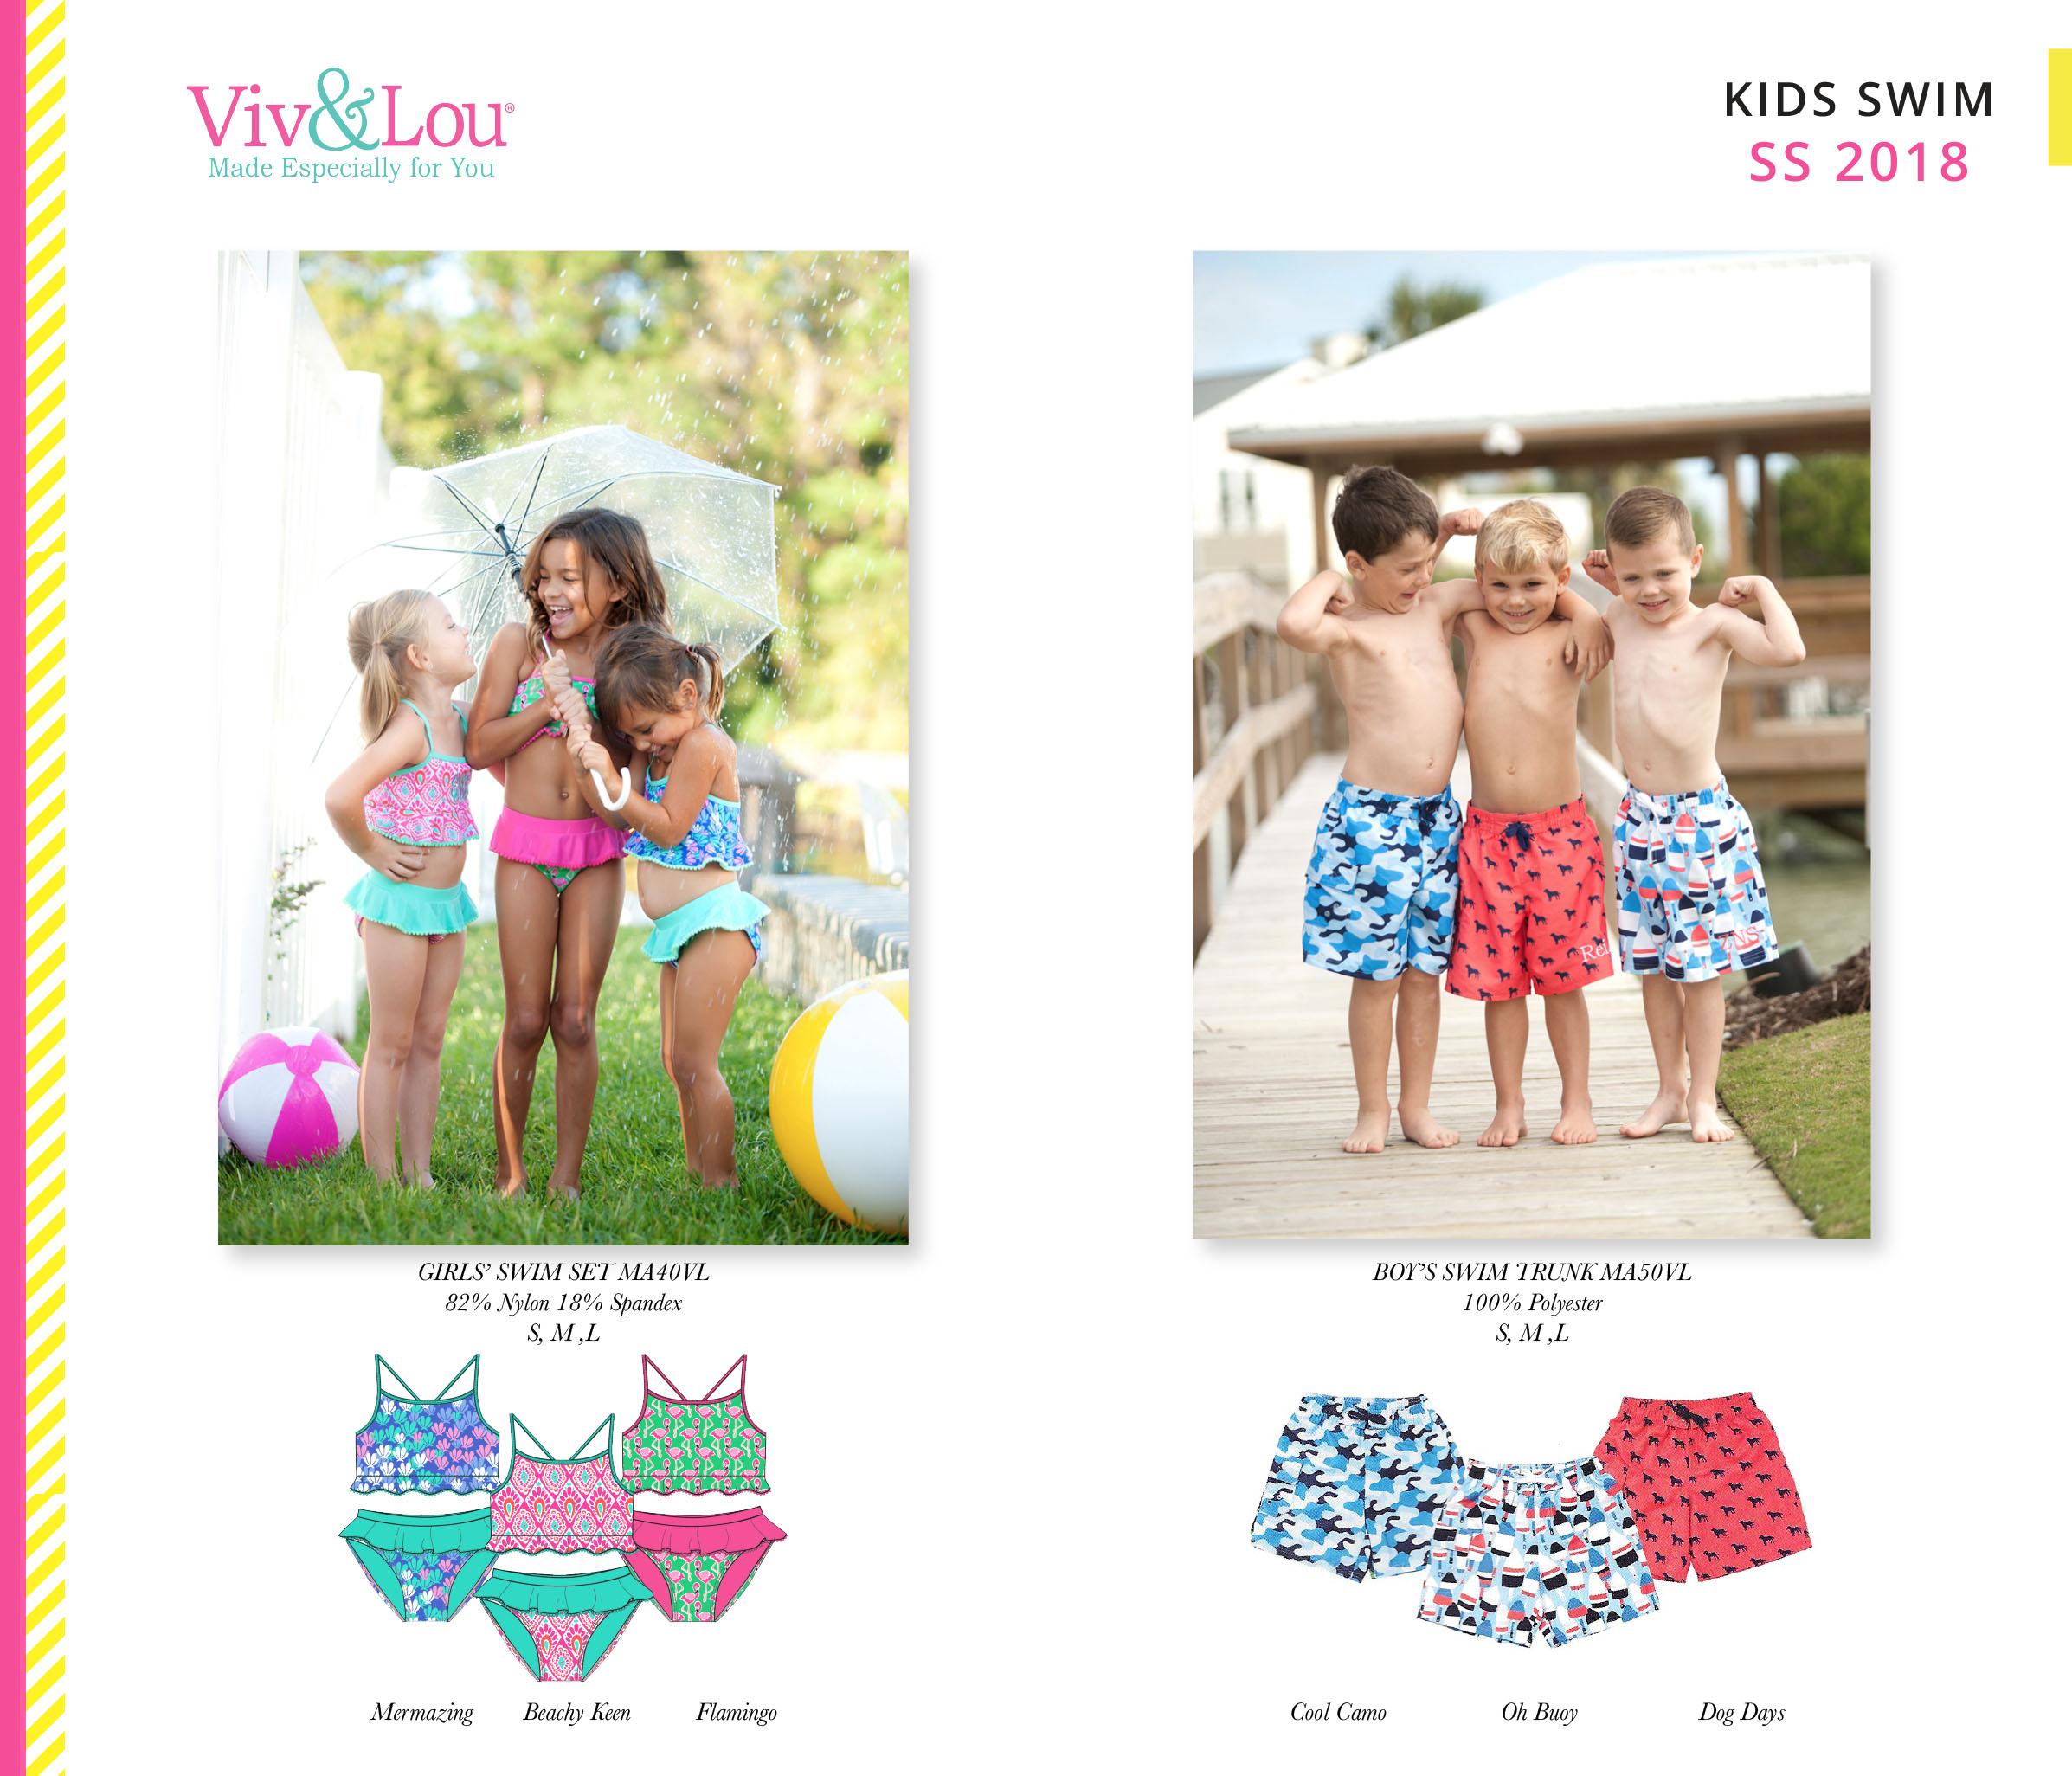 Viv&LouKidsSwim